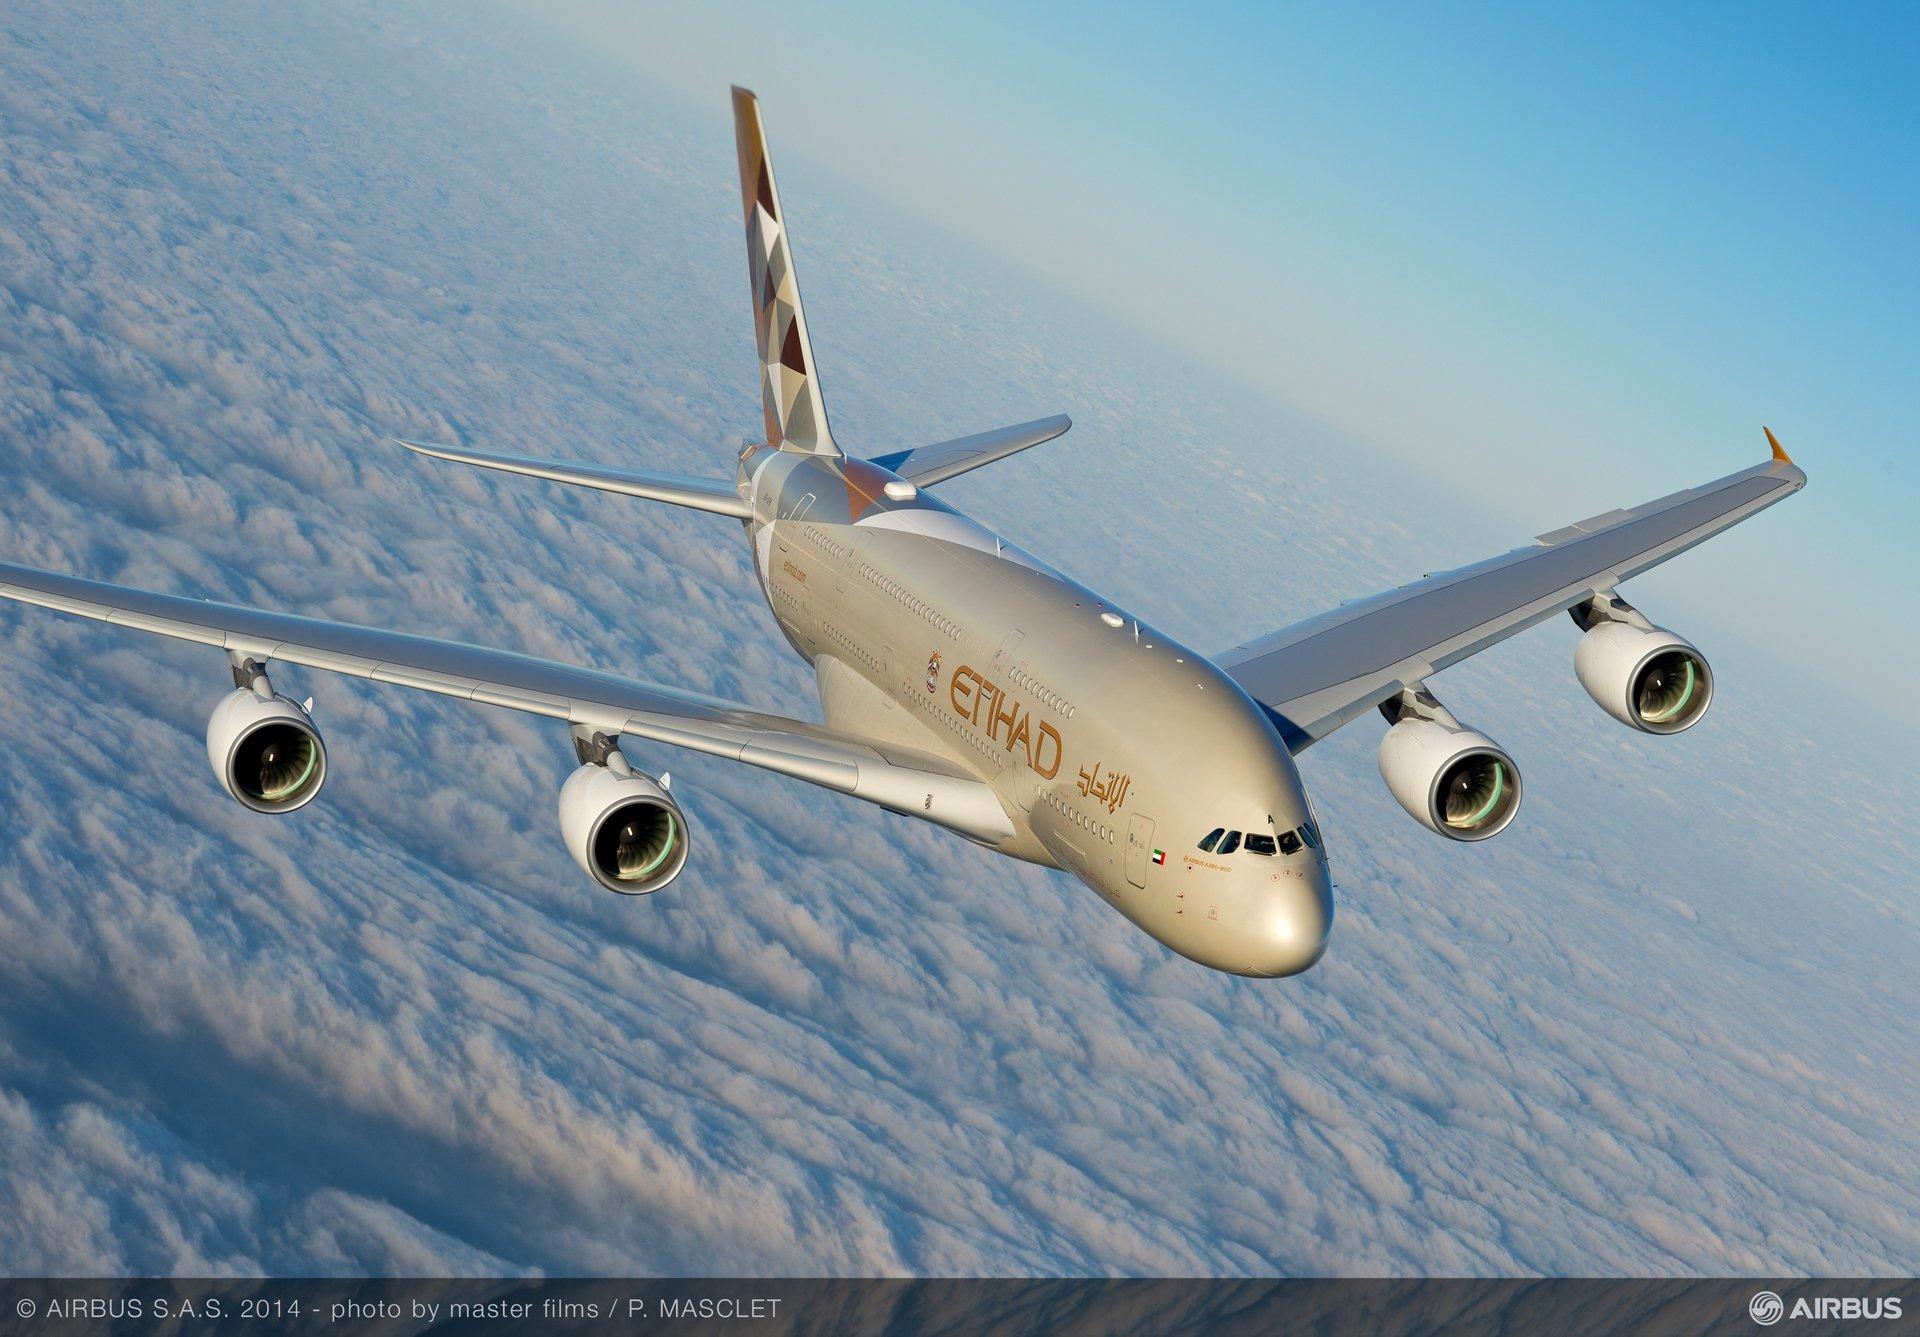 A380 Etihad - In flight 4